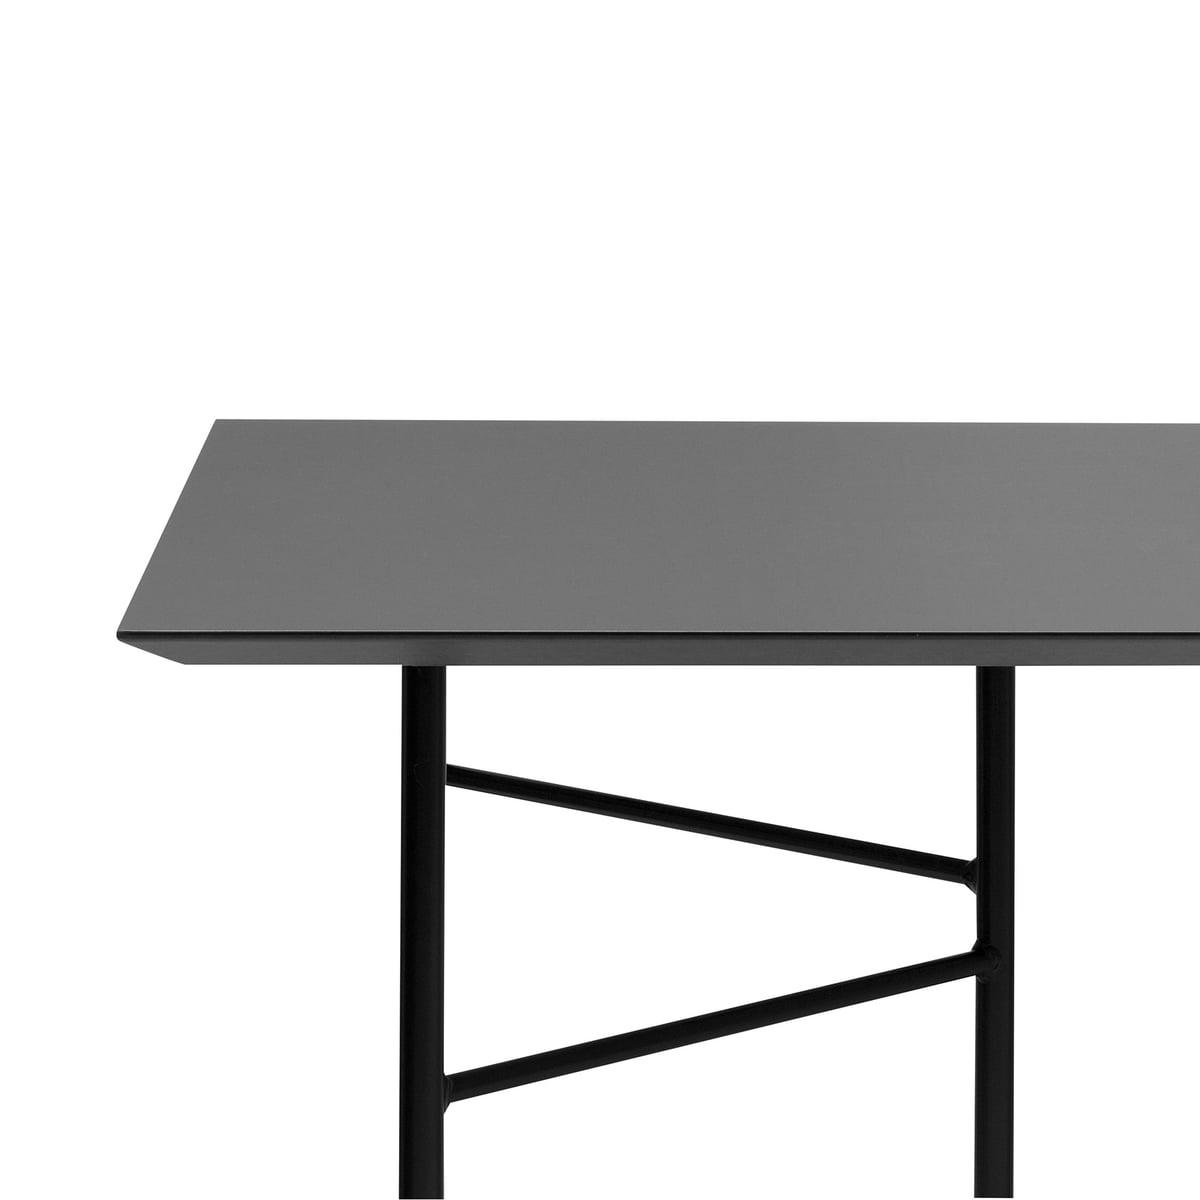 mingle tischplatte linoleum von ferm living connox. Black Bedroom Furniture Sets. Home Design Ideas